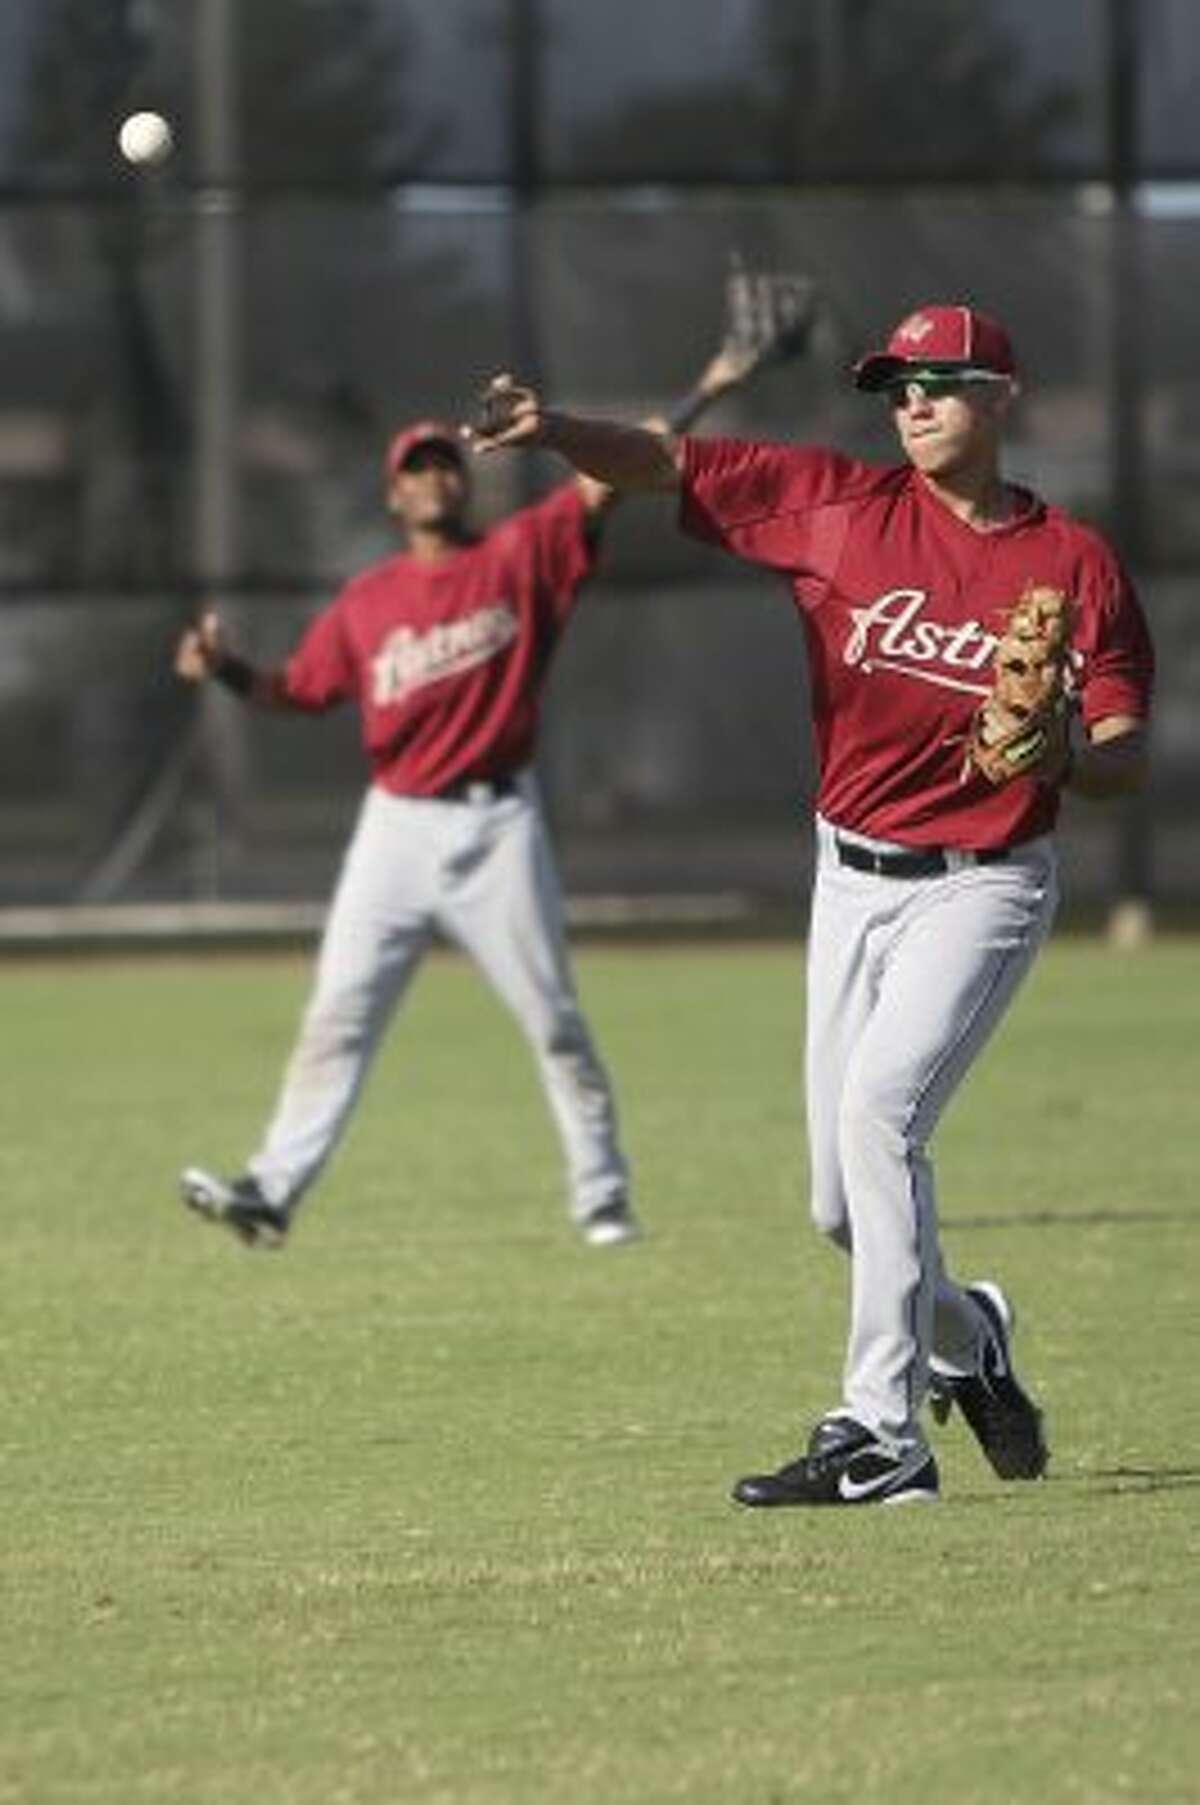 Carlos Correa goes through a workout. (Mayra Beltran / Houston Chronicle)